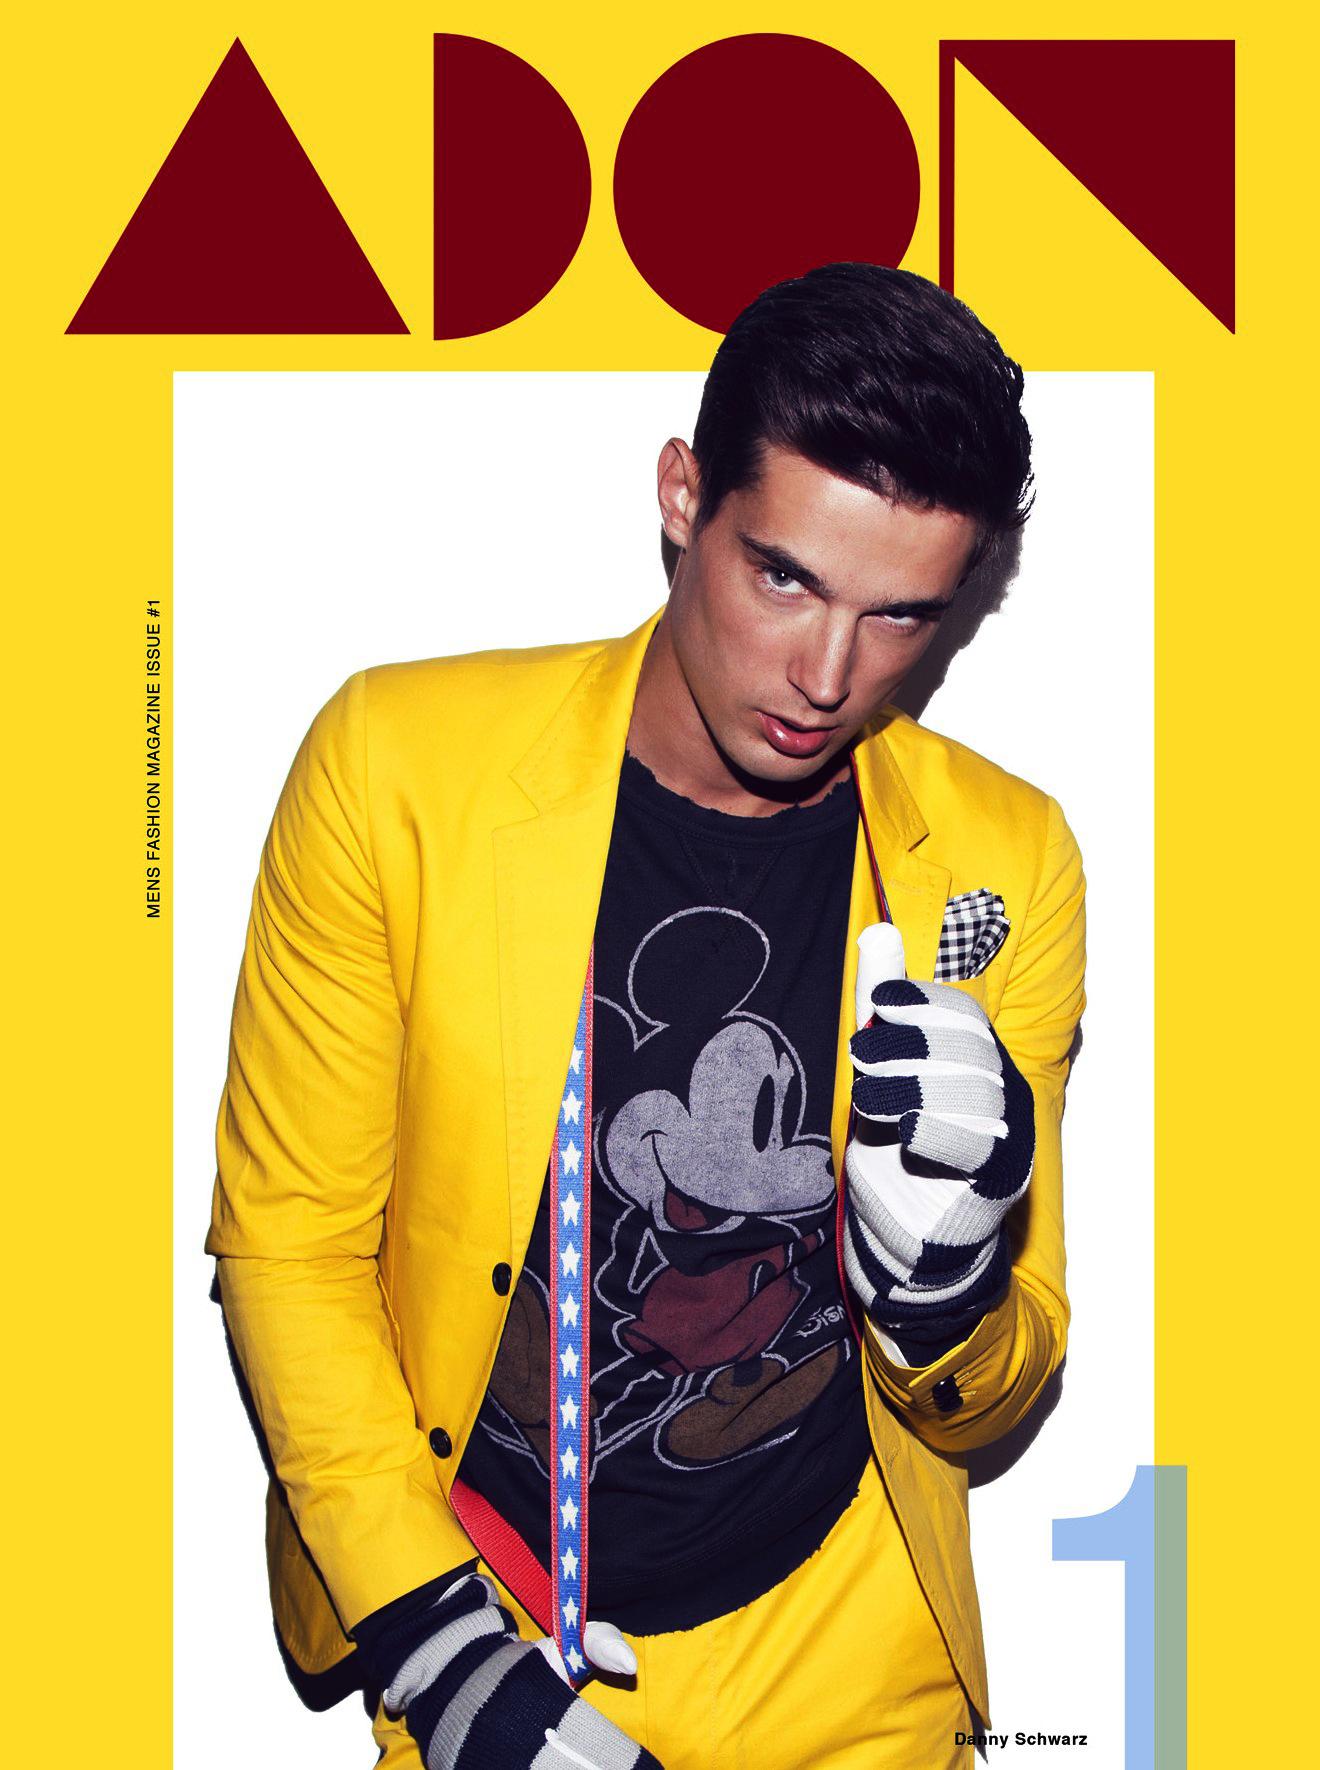 Danny-Schwarz-ADON-Magazine-cover-november-2012